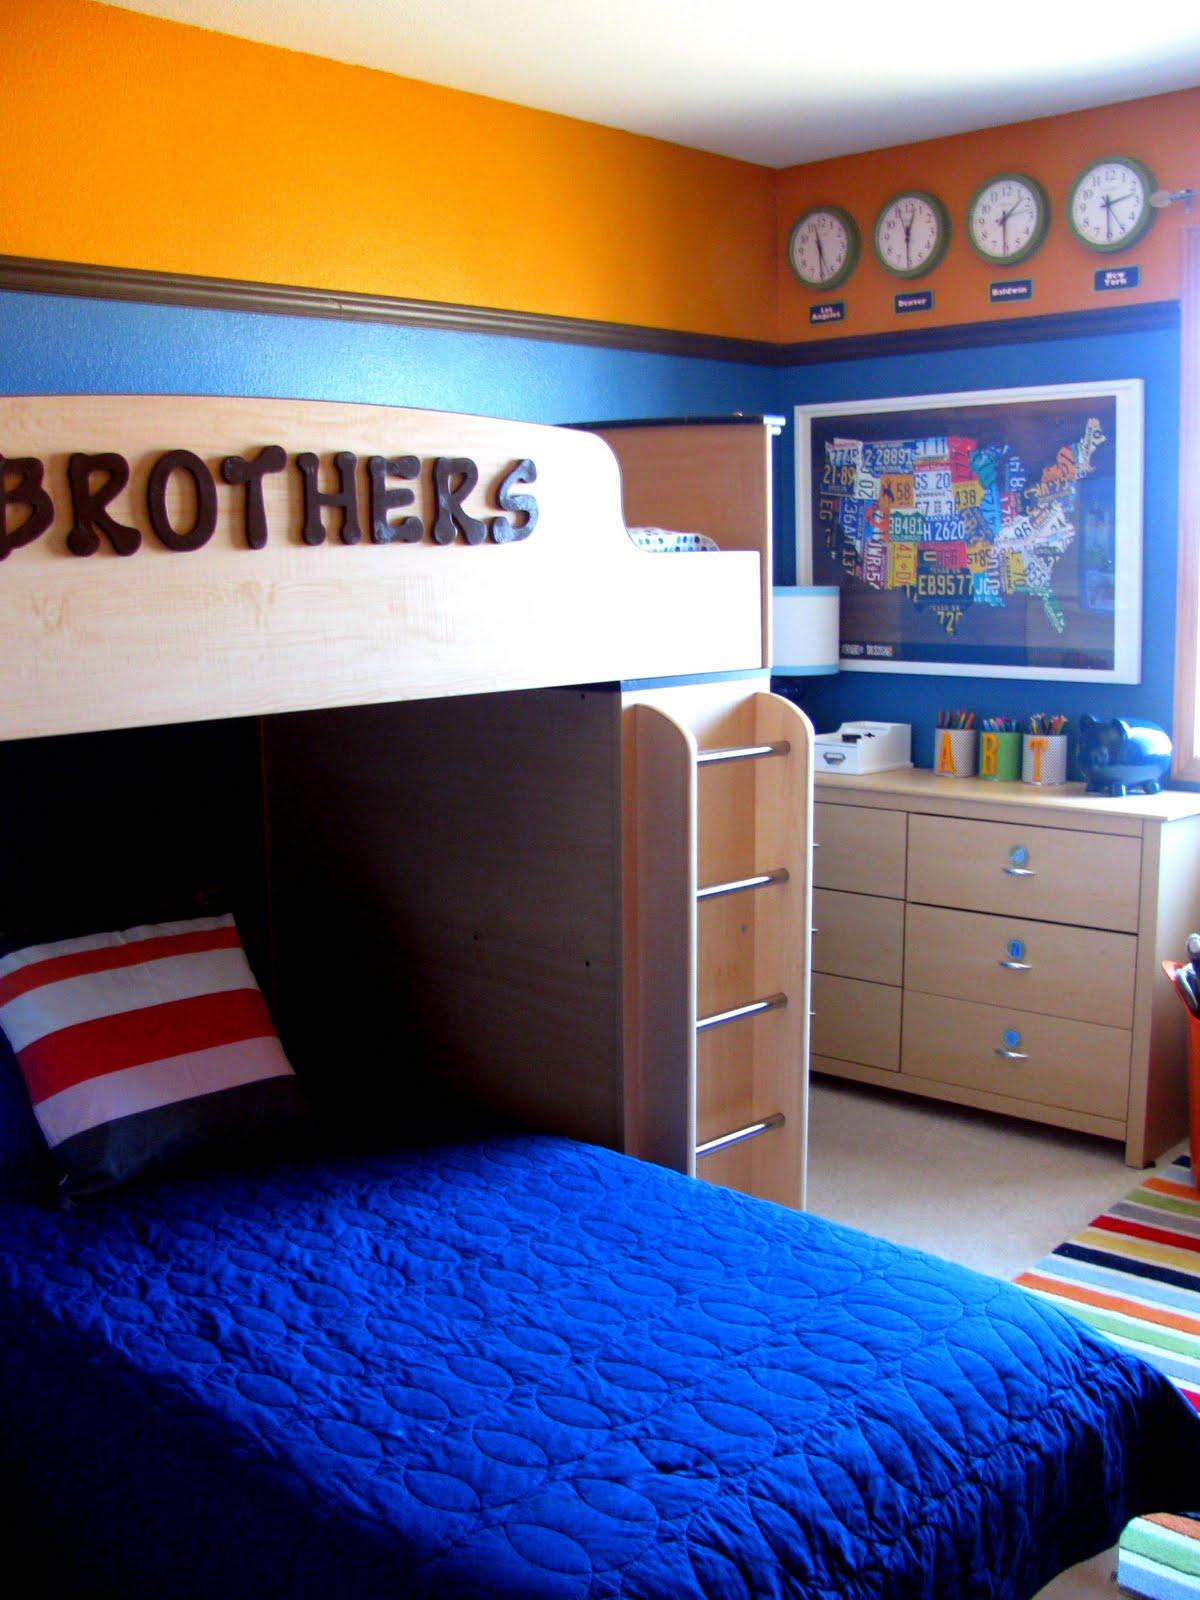 Kids bedroom painting ideas wallpress 1080p hd desktop - Boys room paint ideas ...